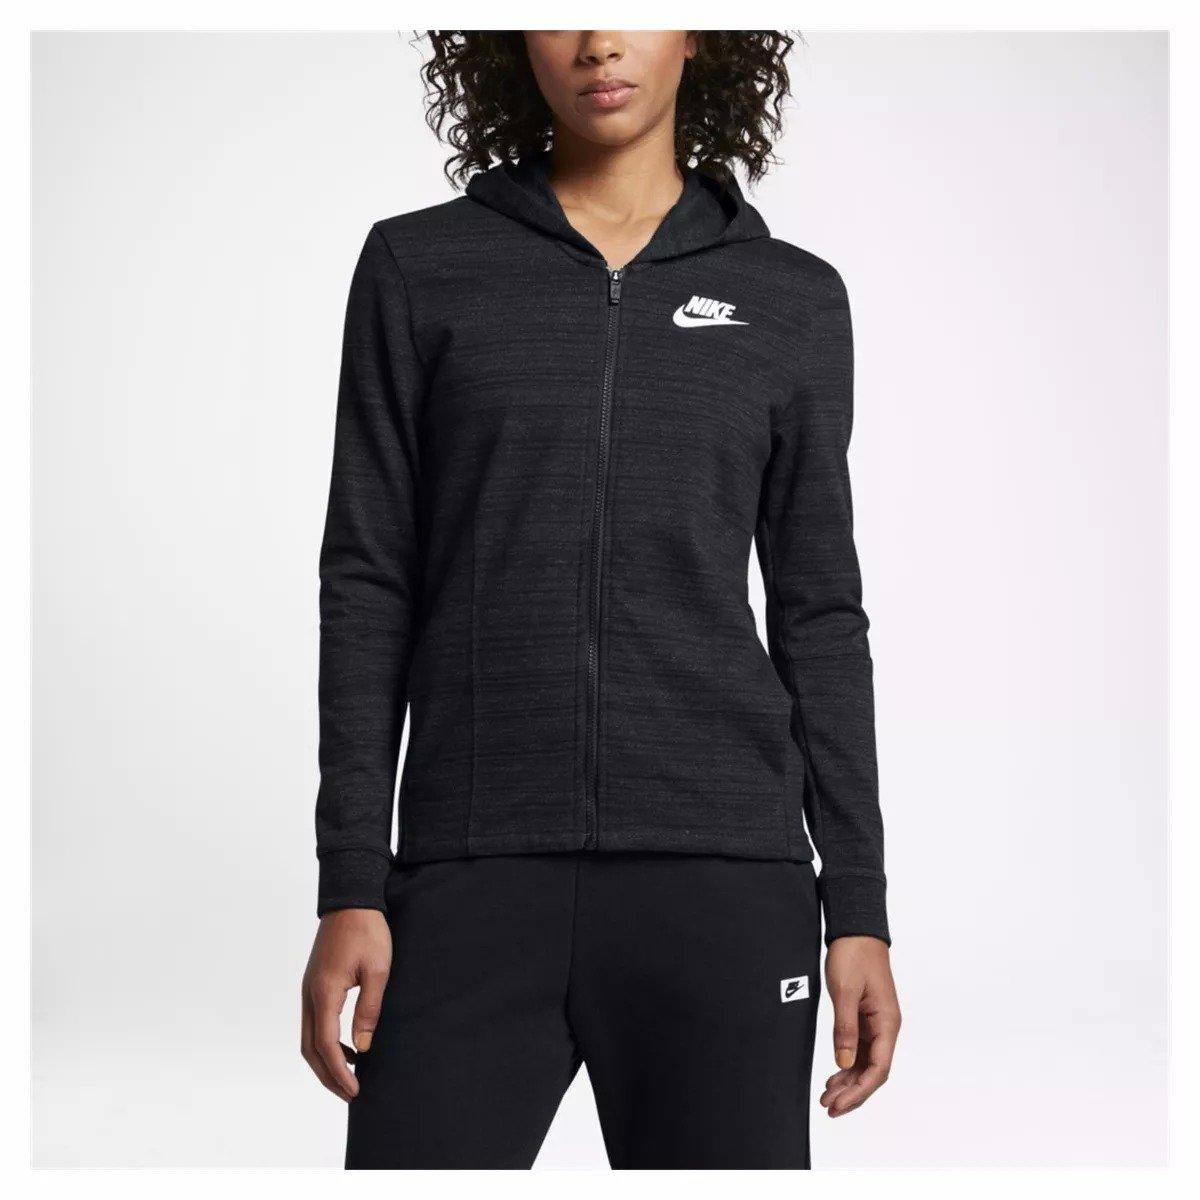 5de1e56208 Jaqueta Nike Sportswear Advance 15 Feminino 837458 Nike - PT ...